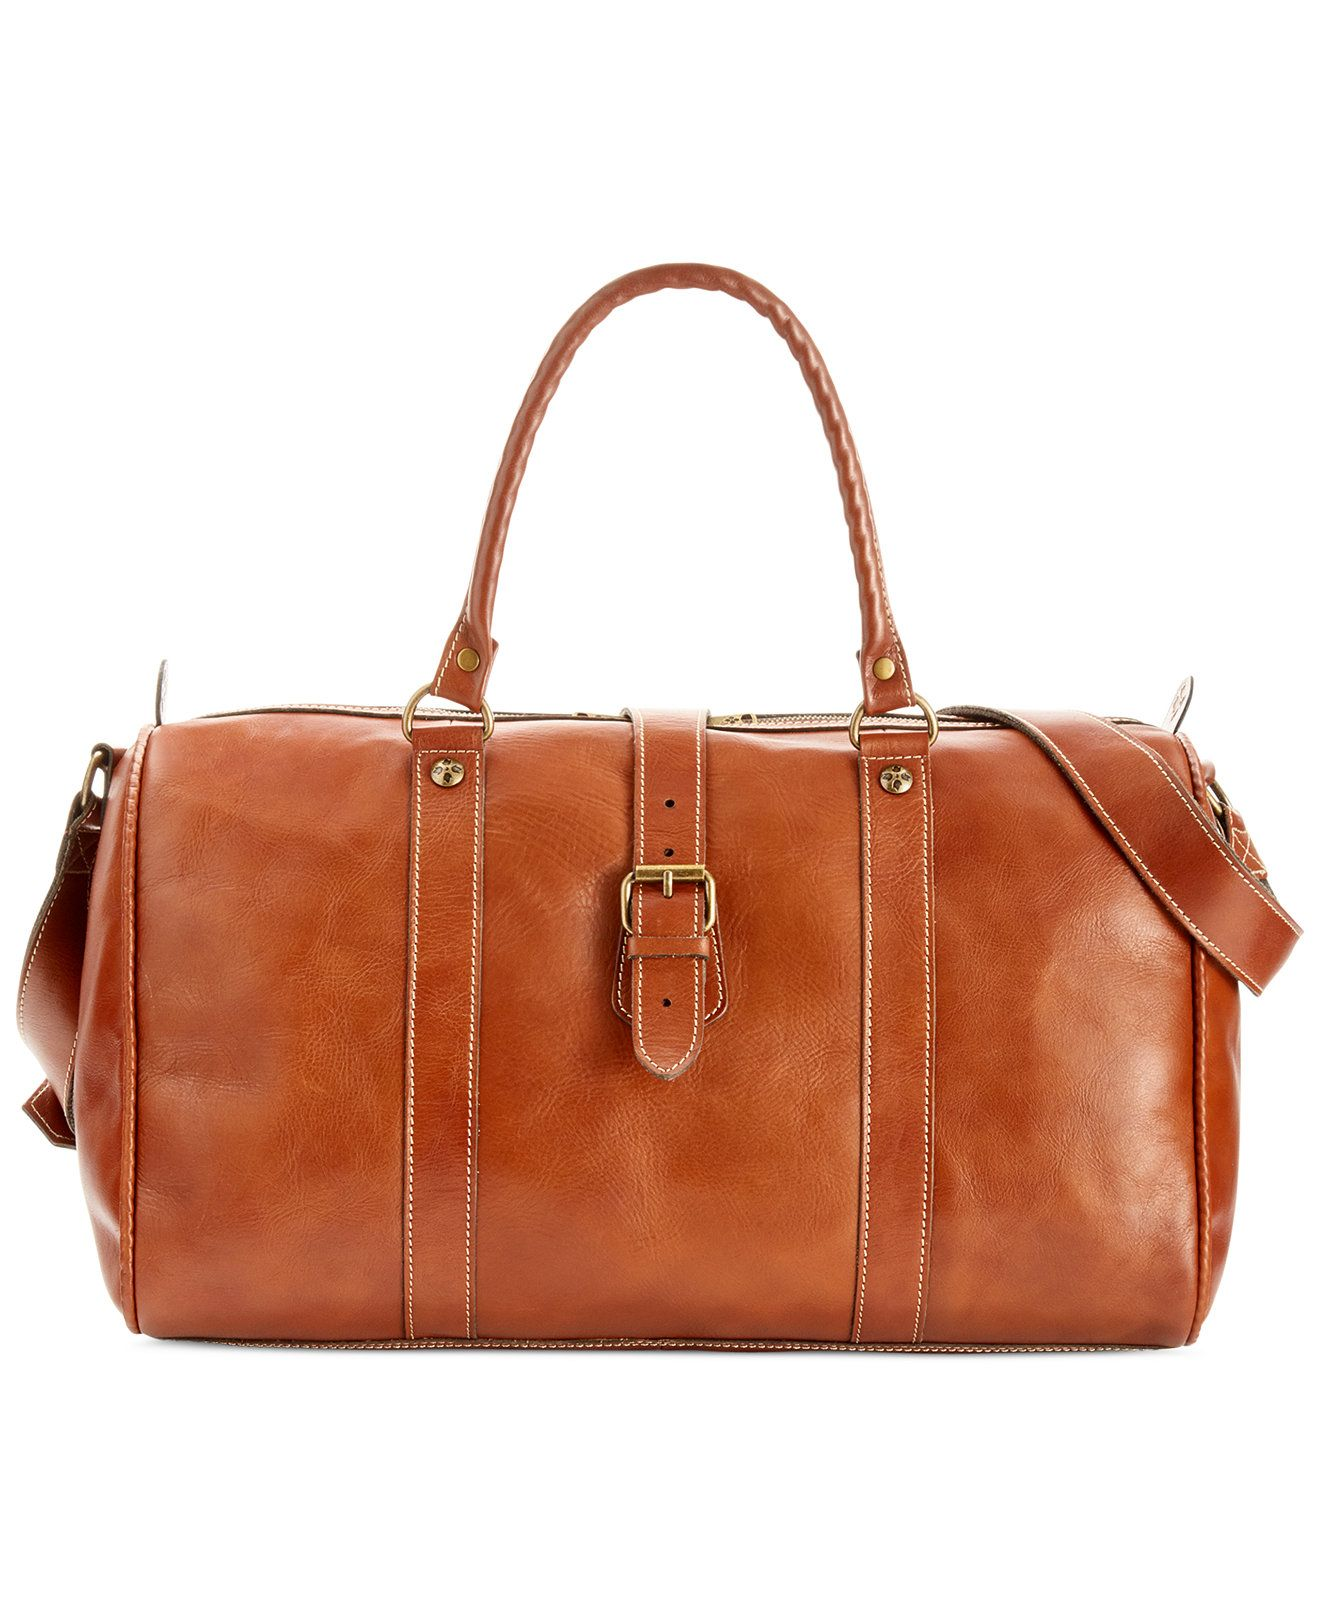 Patricia Nash Thebes Weekender - Patricia Nash - Handbags & Accessories - Macy's